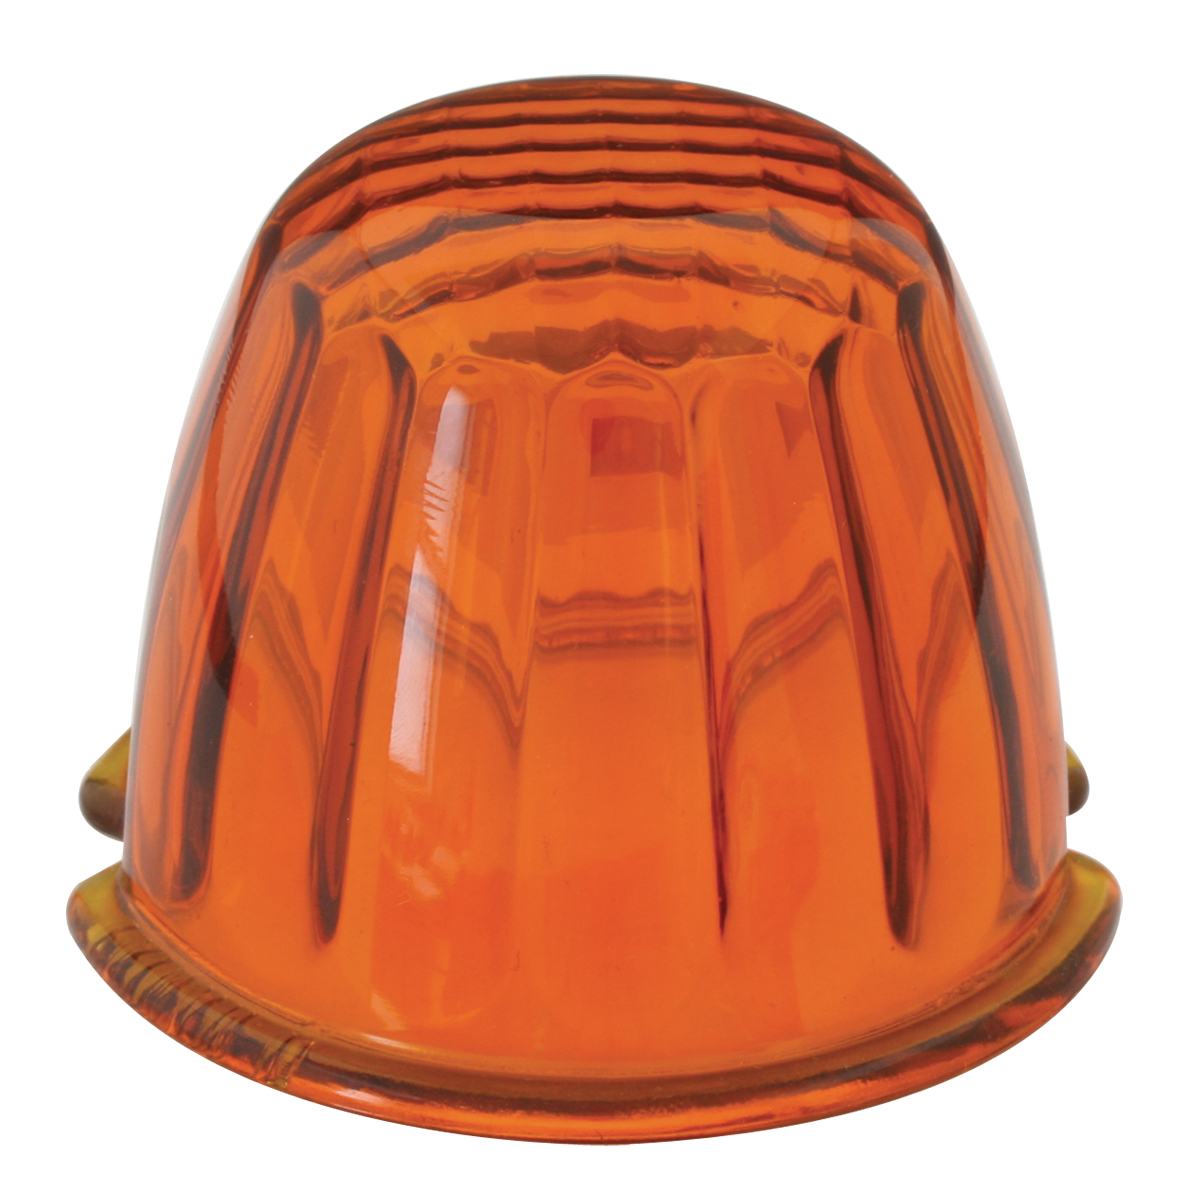 #92001 Reflector Dark Amber Glass Lens